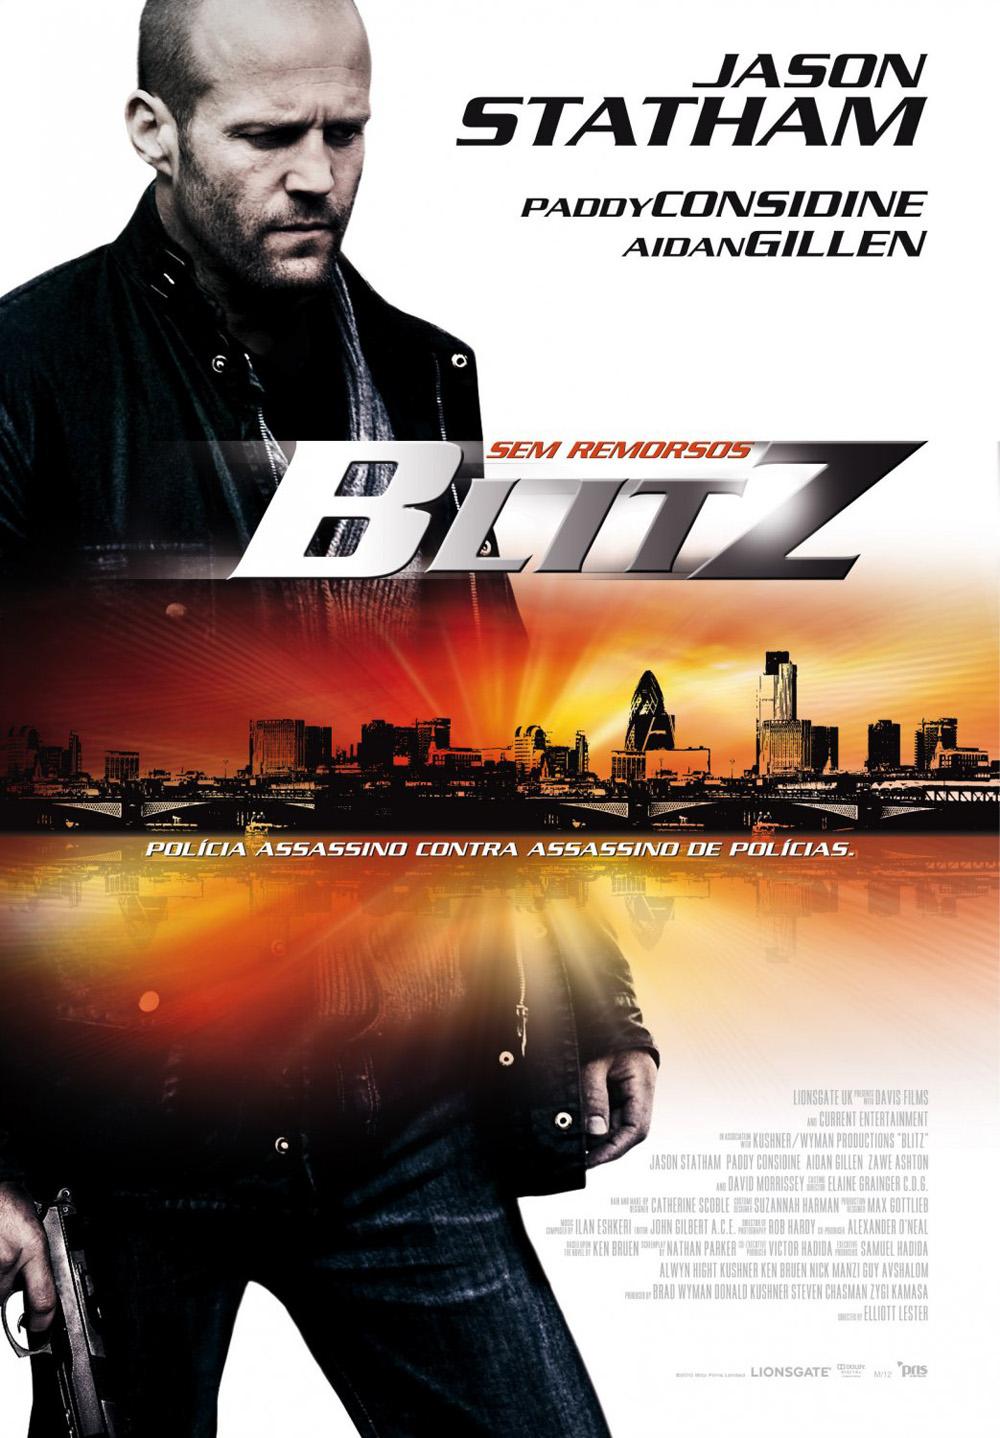 Blitz บลิทซ์ ล่าโคตรคลั่งล้าง สน. [HD][พากย์ไทย]